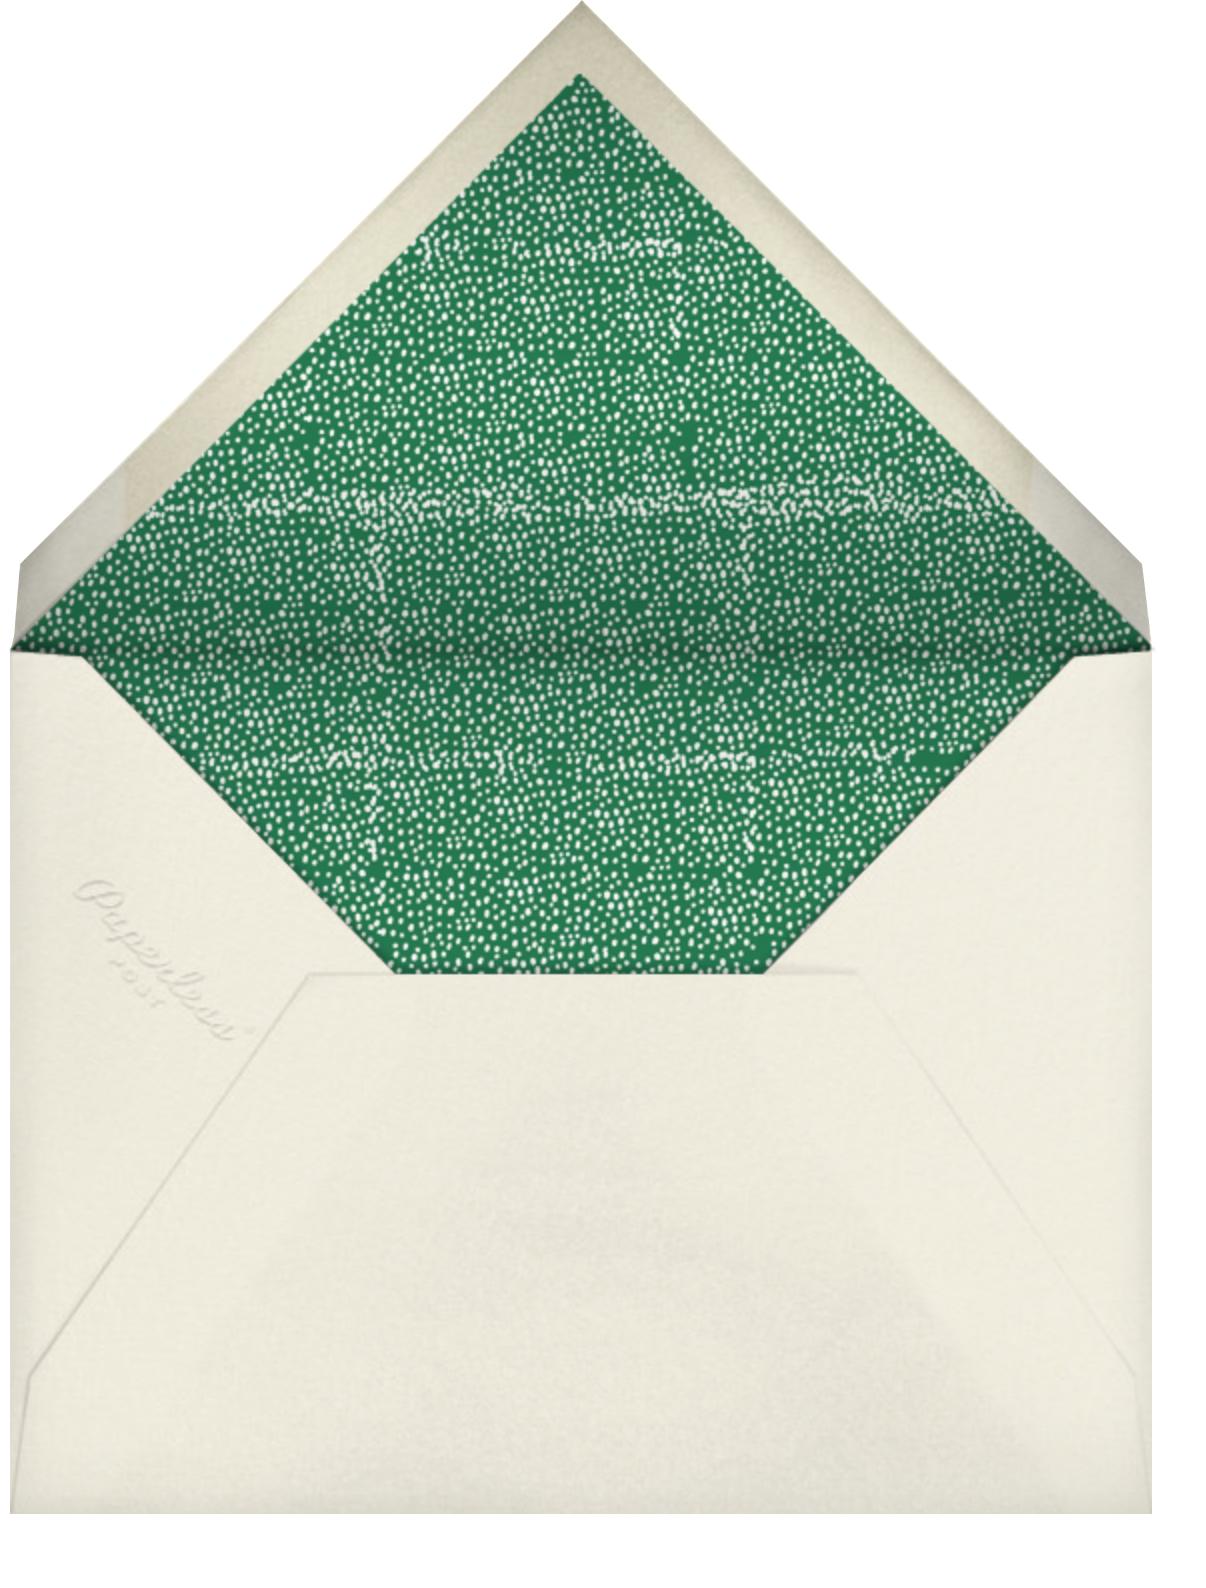 Regal Turkey - Greeting - Mr. Boddington's Studio - Thanksgiving - envelope back